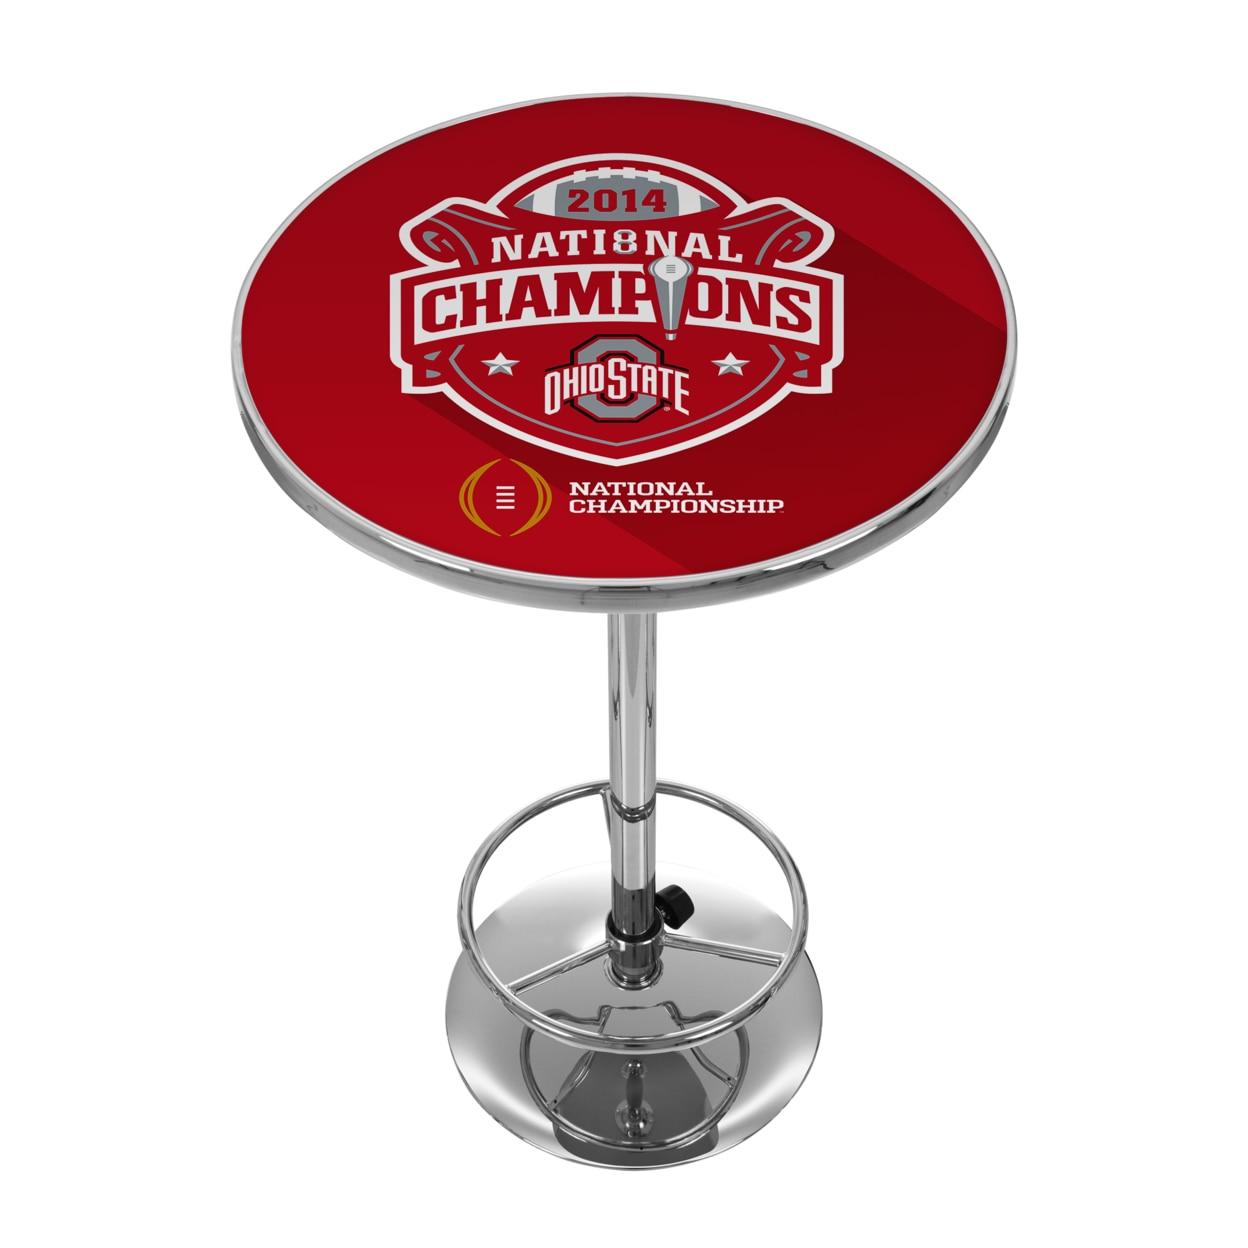 Ohio State University National Champions Chrome 42 Inch Pub Table ботинки meindl meindl ohio 2 gtx® женские